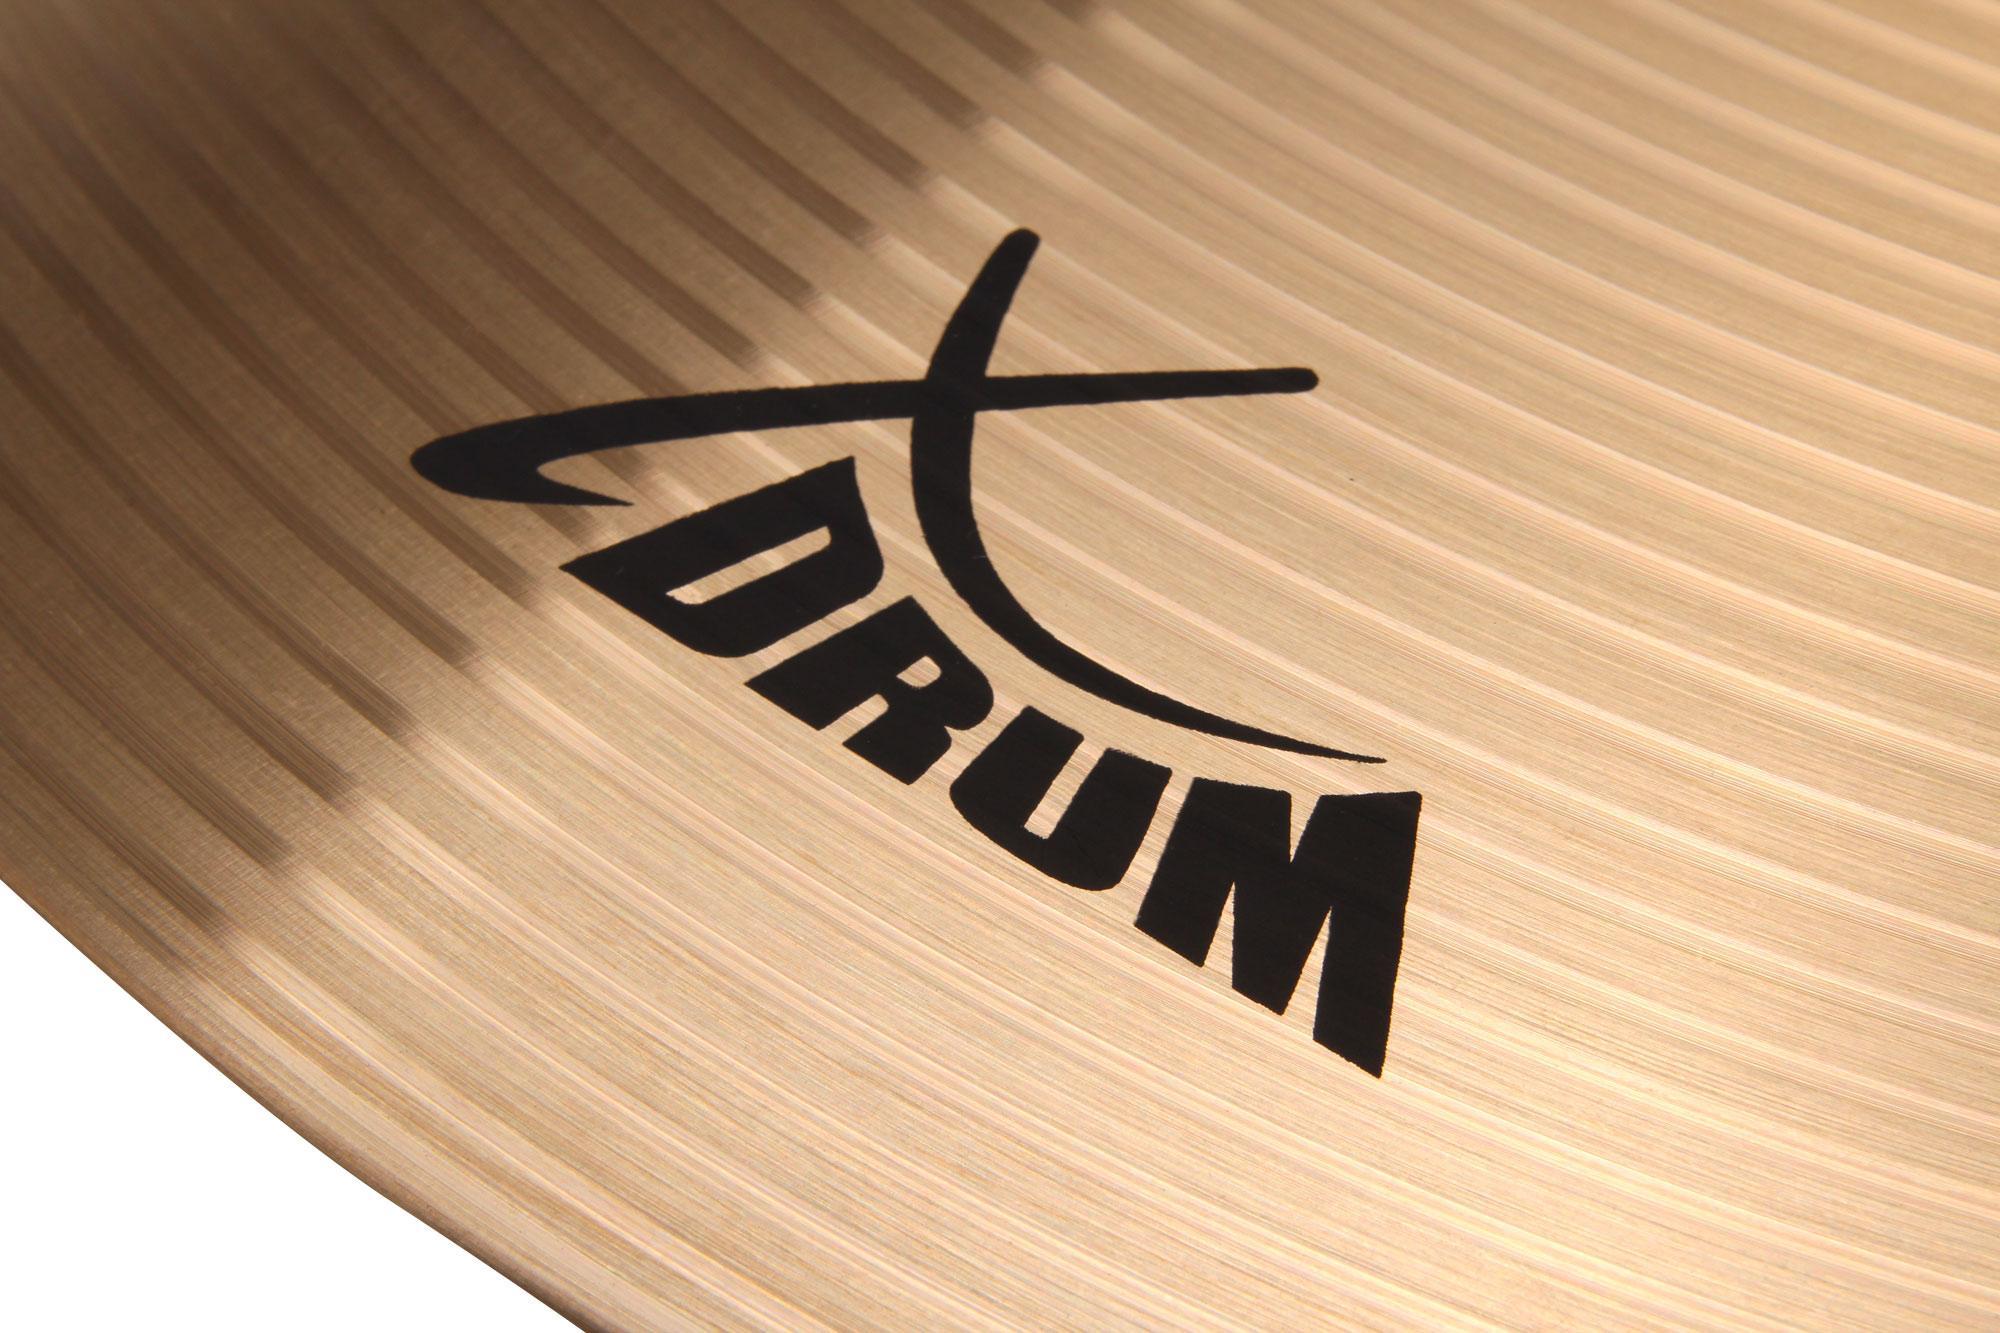 xdrum eco cymbal 10 splash. Black Bedroom Furniture Sets. Home Design Ideas